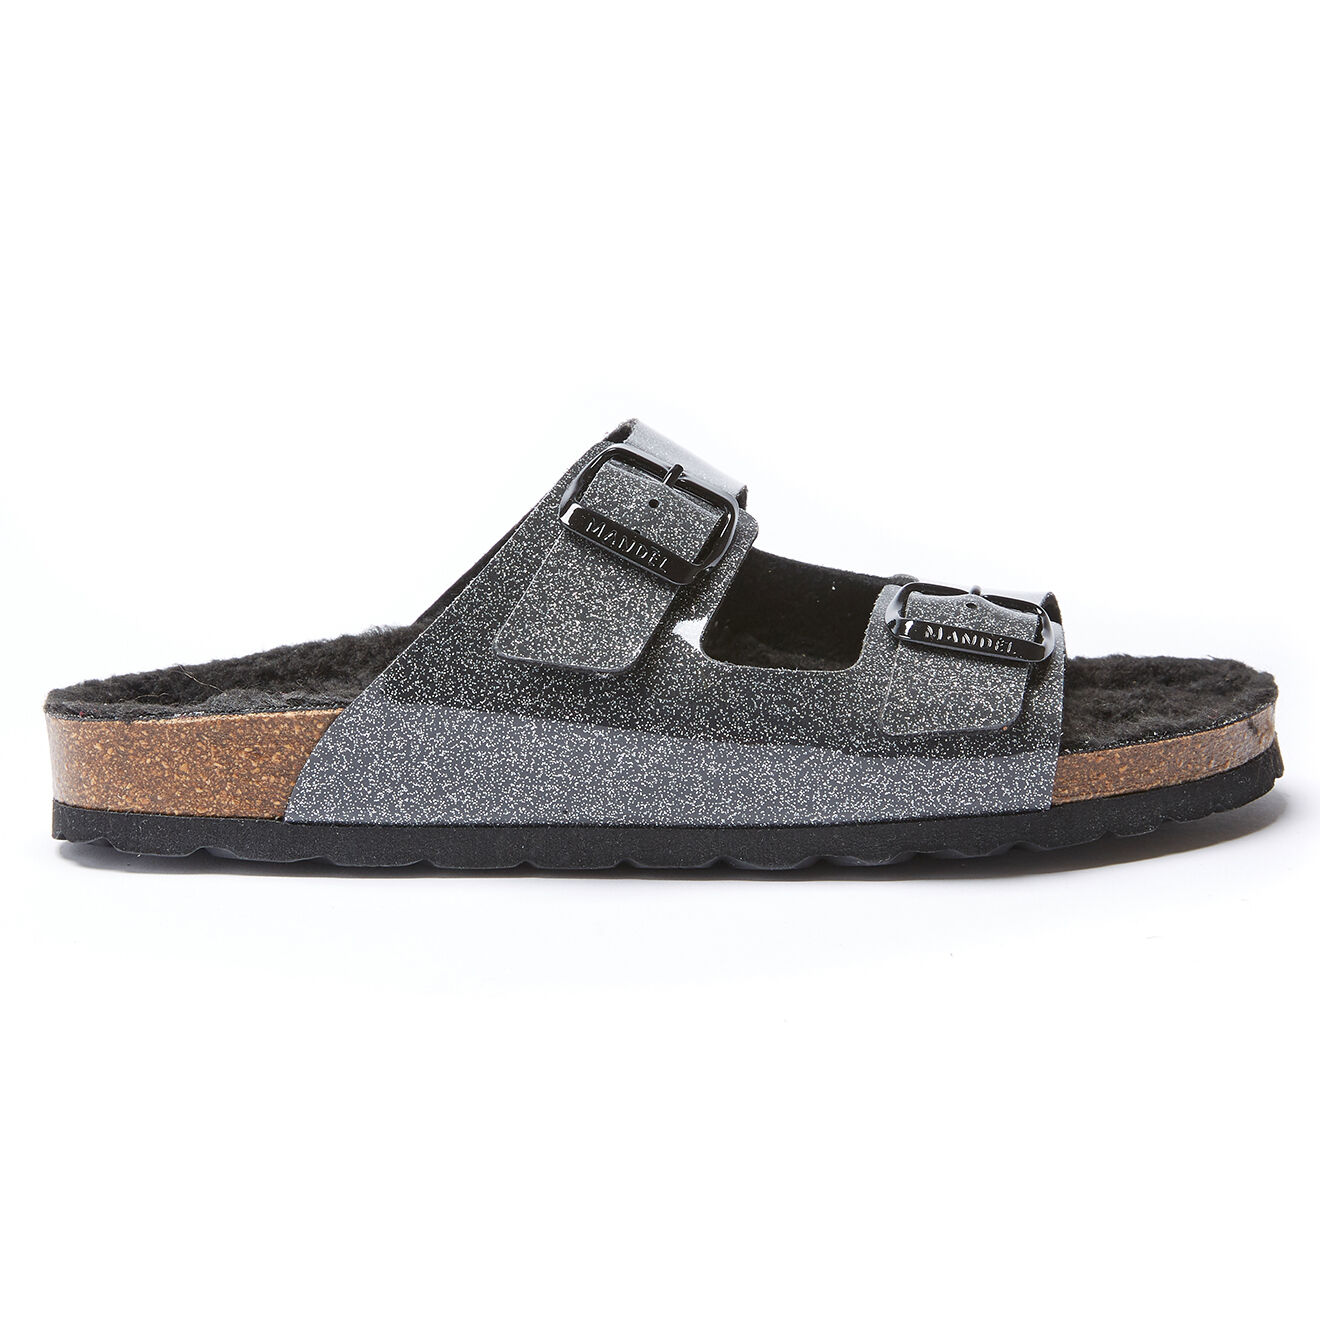 Sandales Alberto noires